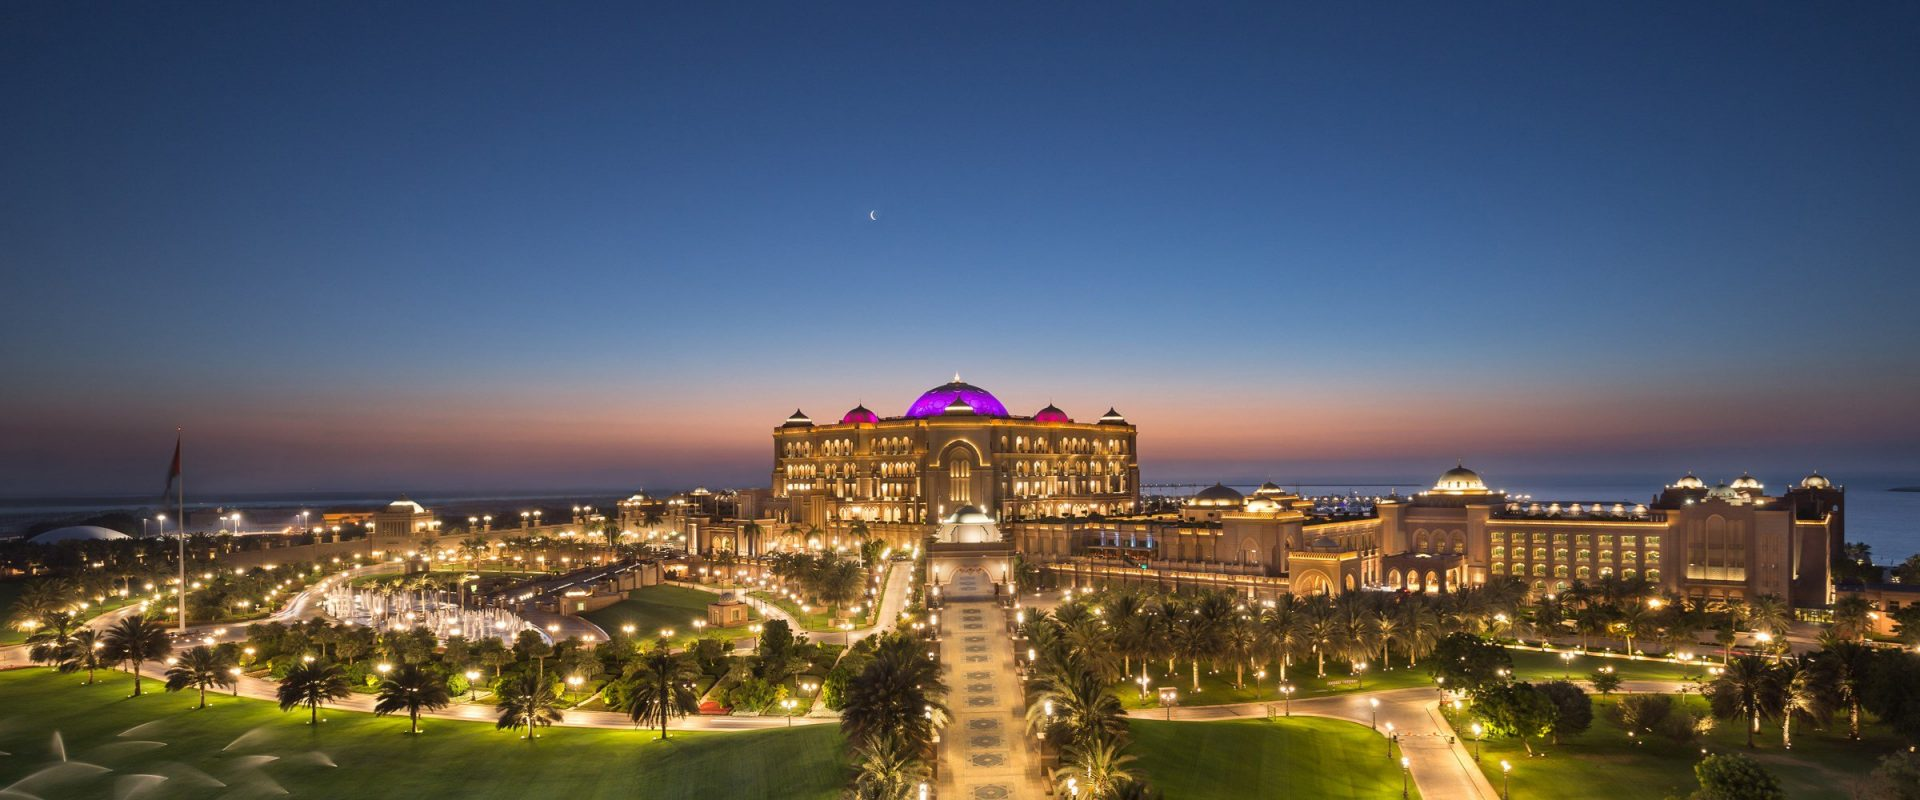 world's most expensive hotel-Emirates Abu Dhabi